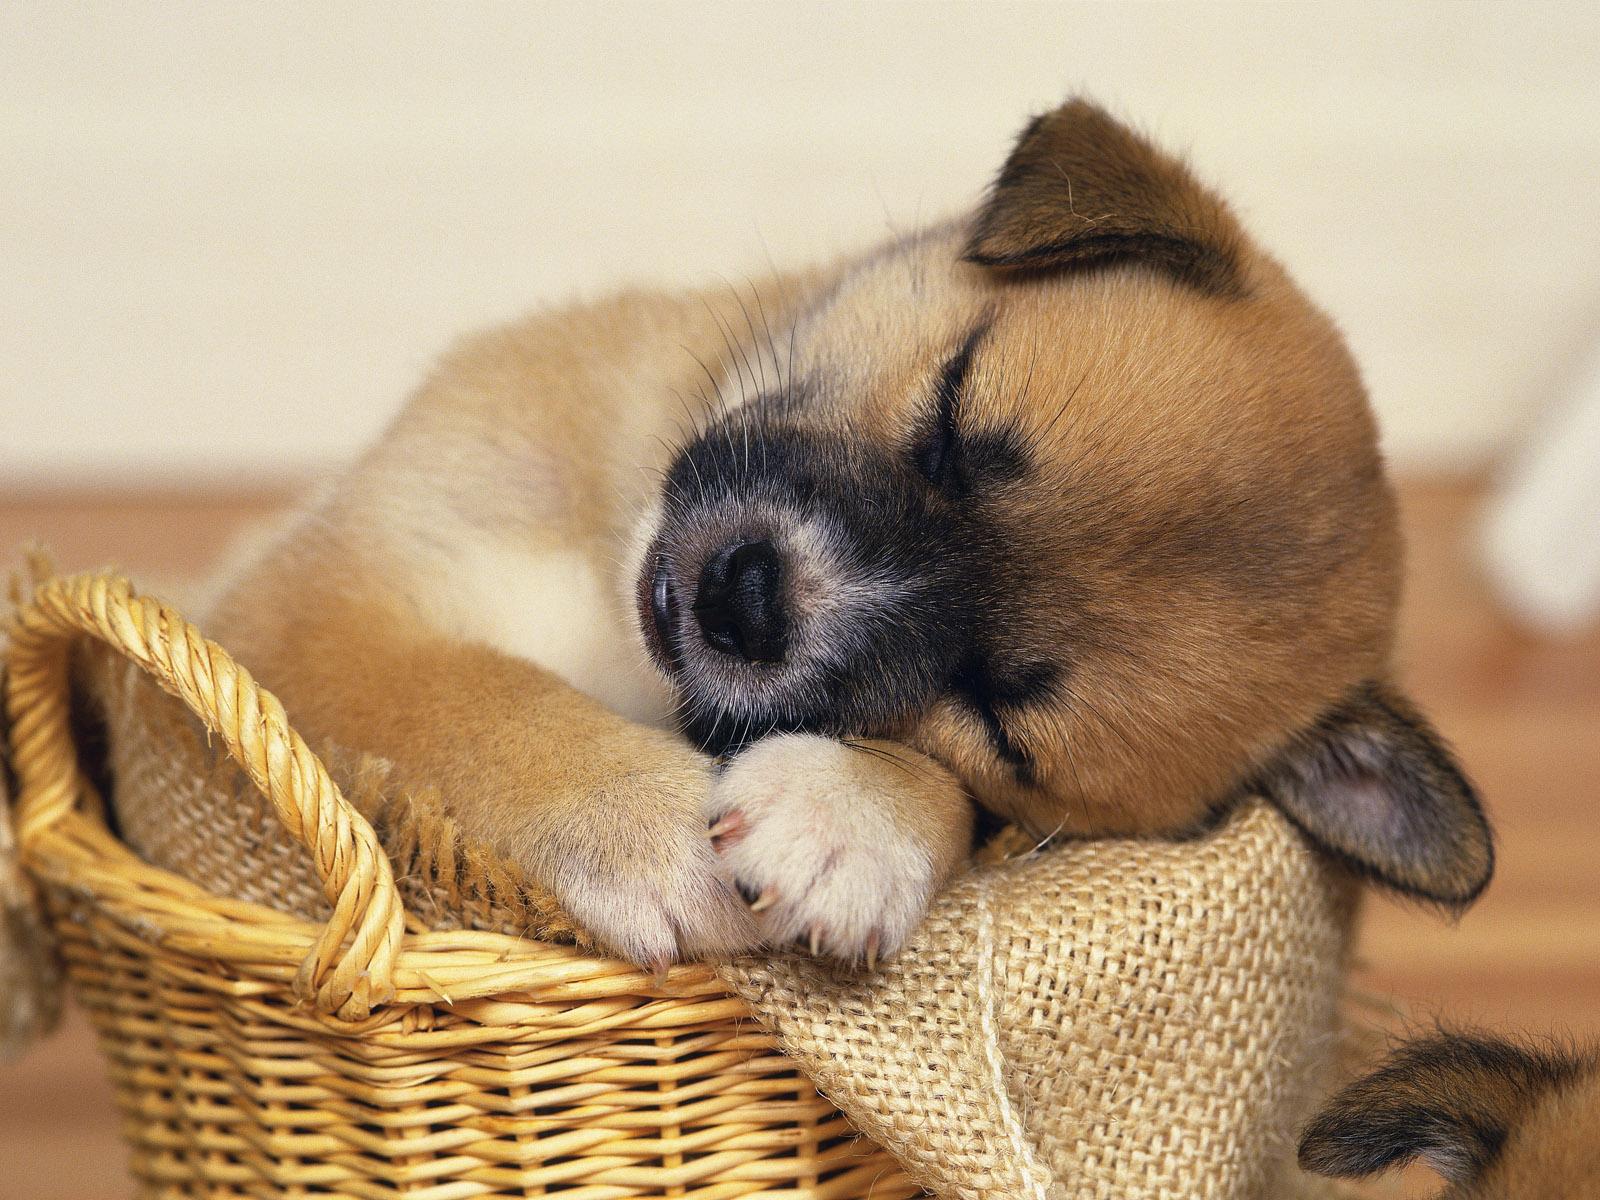 Cute Dog Wallpaper  Downloadjpg 1600x1200